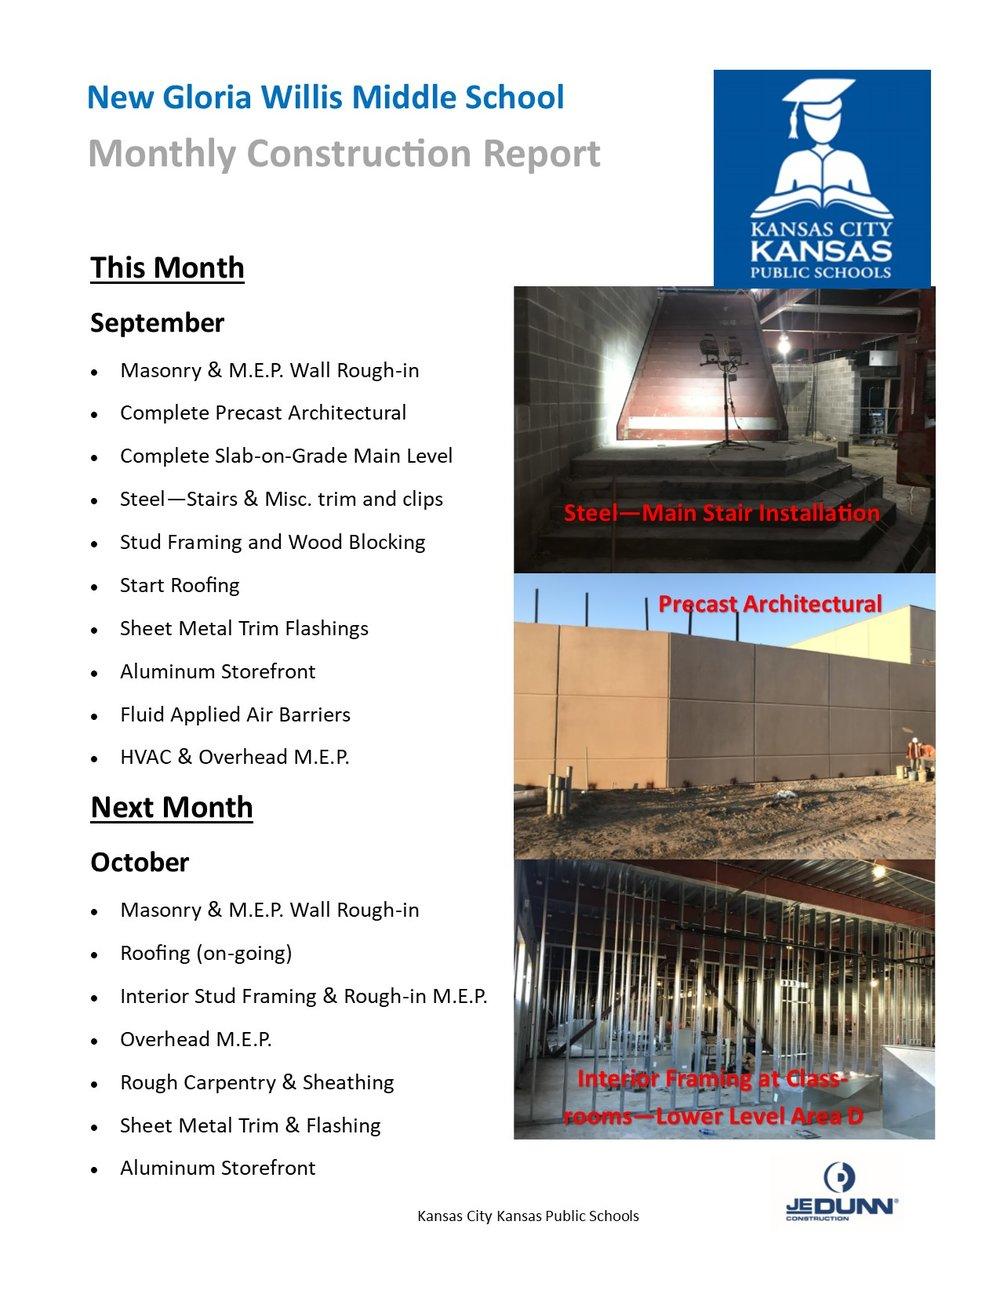 2018.09.14 - GWMS September Photo Report.jpg